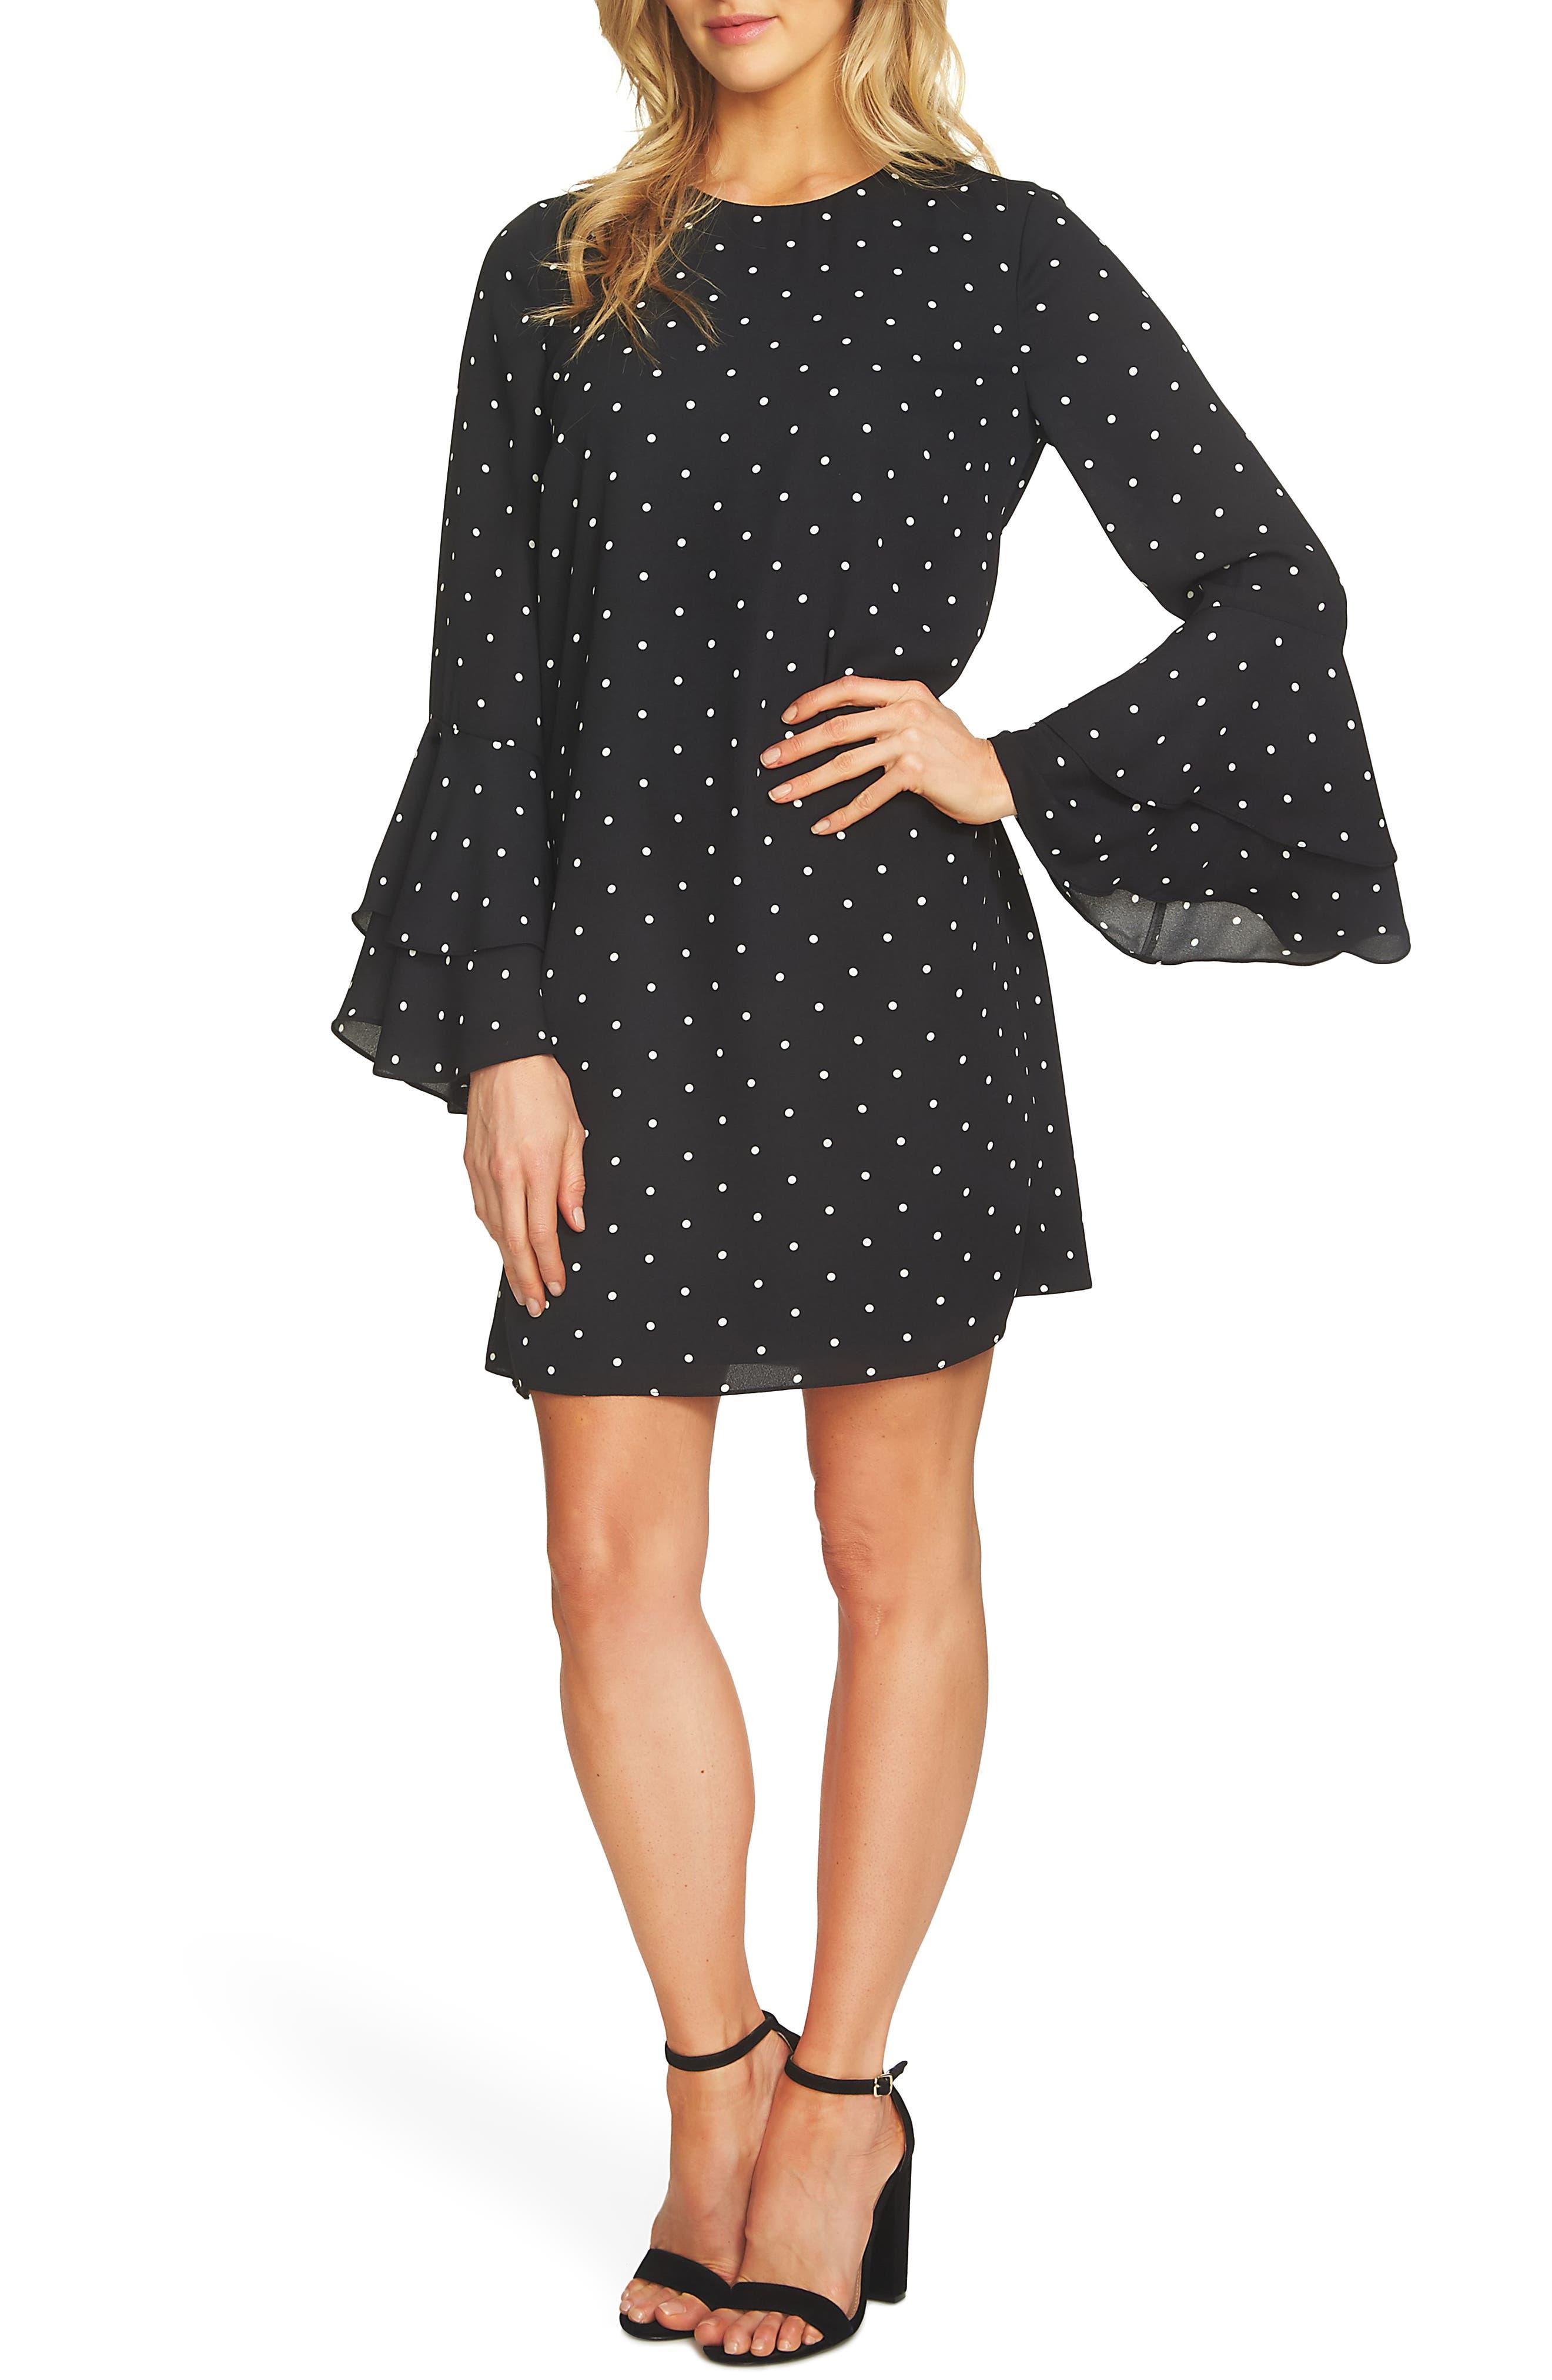 Main Image - CeCe Bell Sleeve Polka Dot Dress